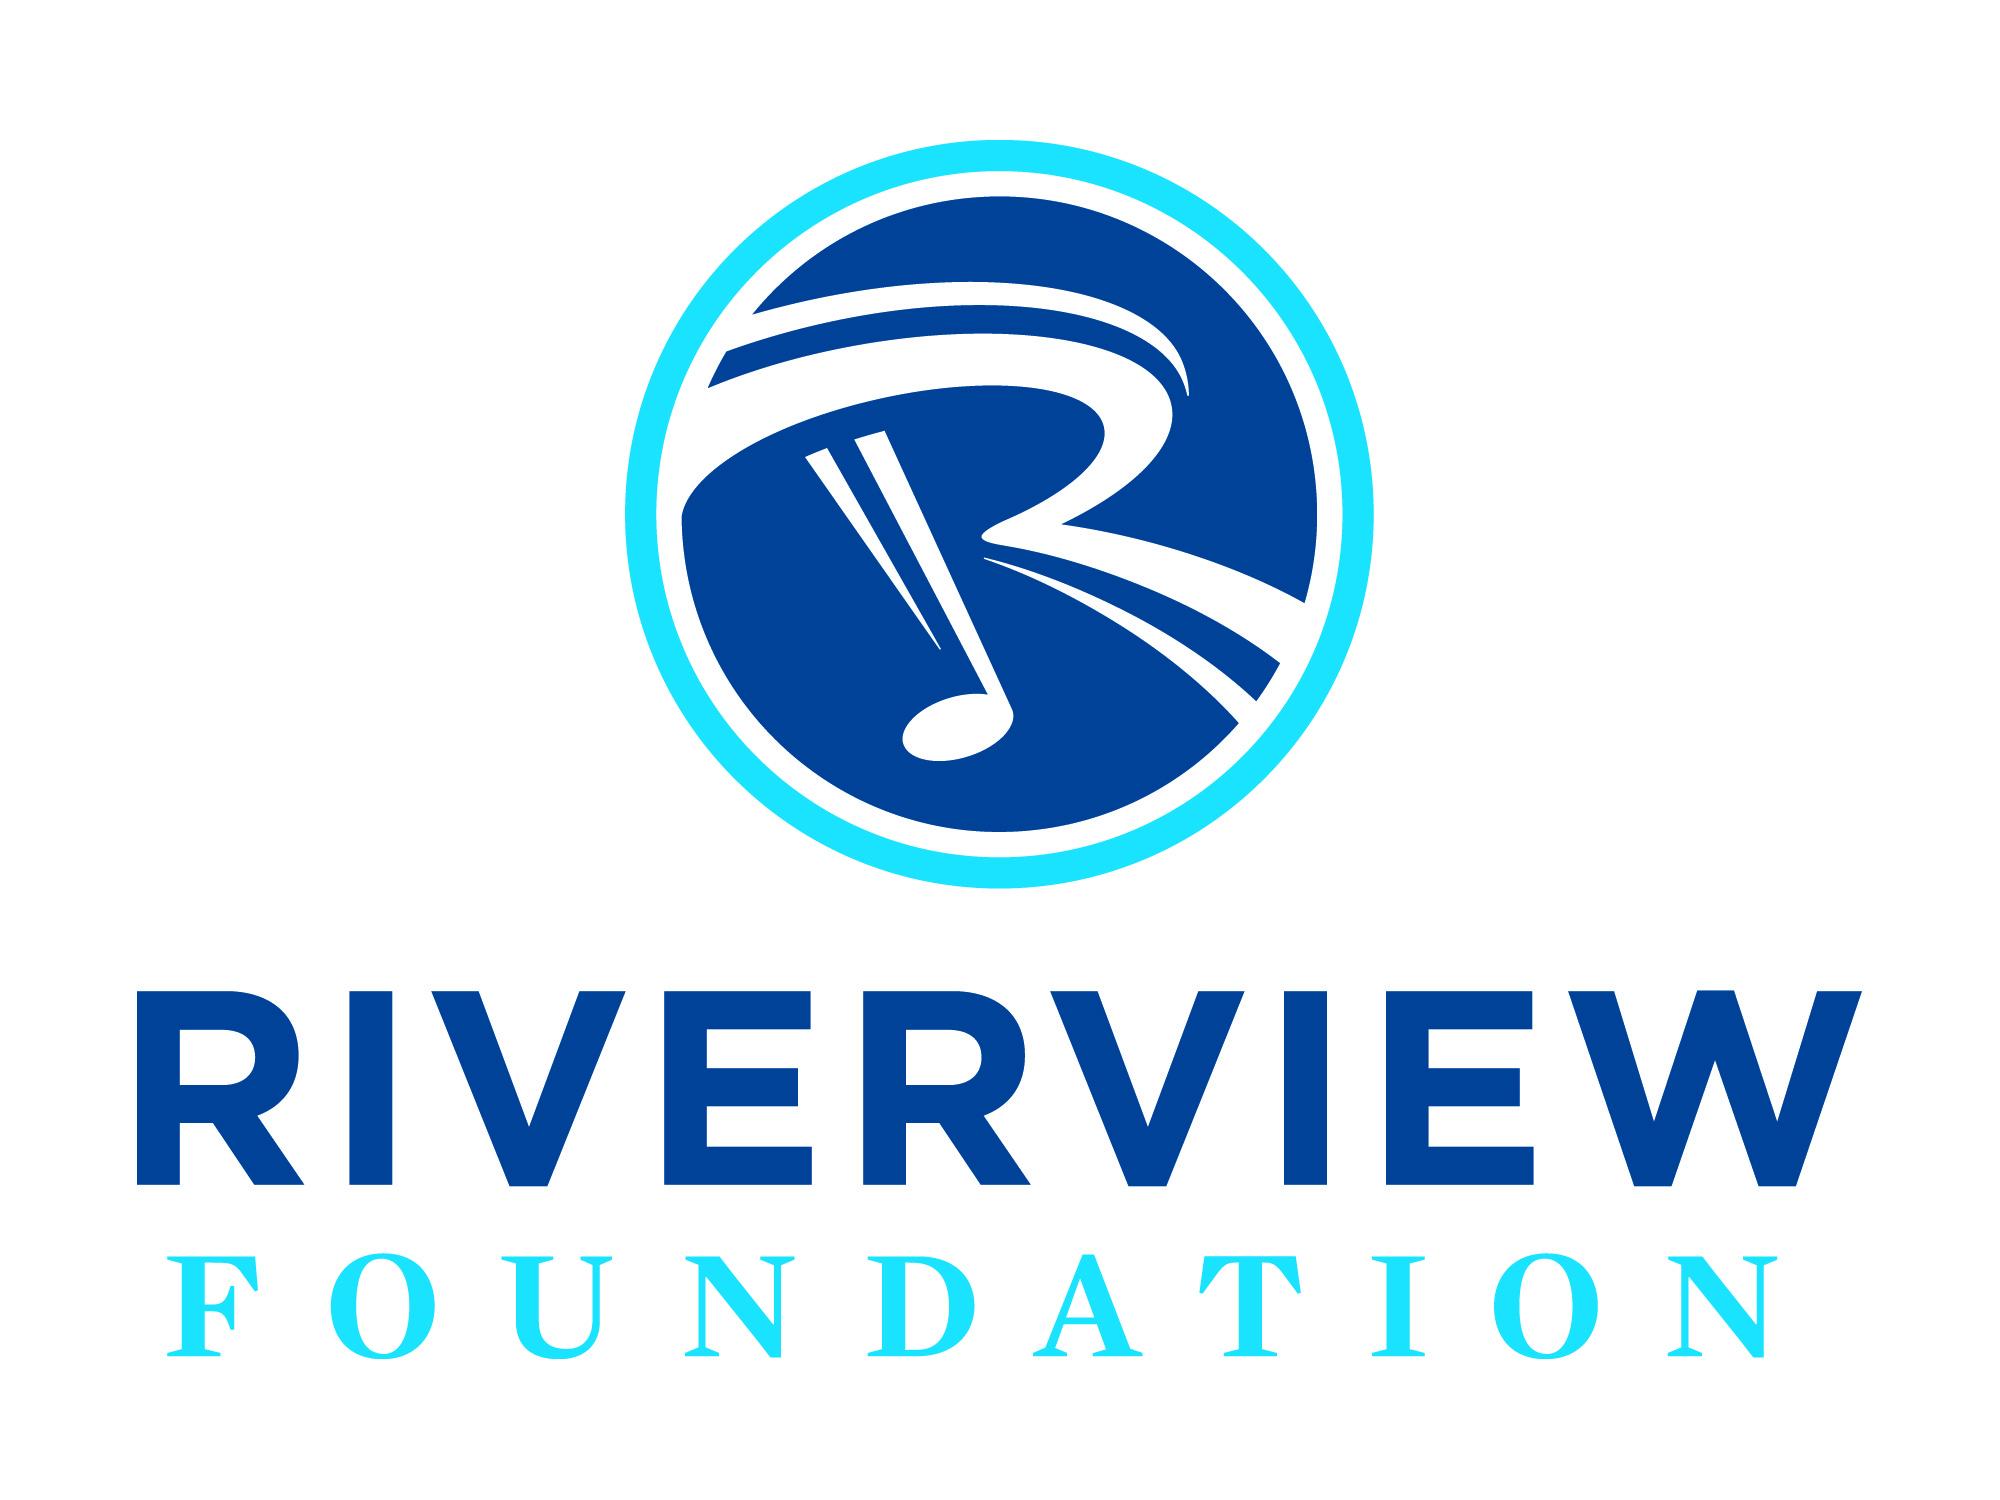 RiverviewFoundation_Main_Logo.jpg